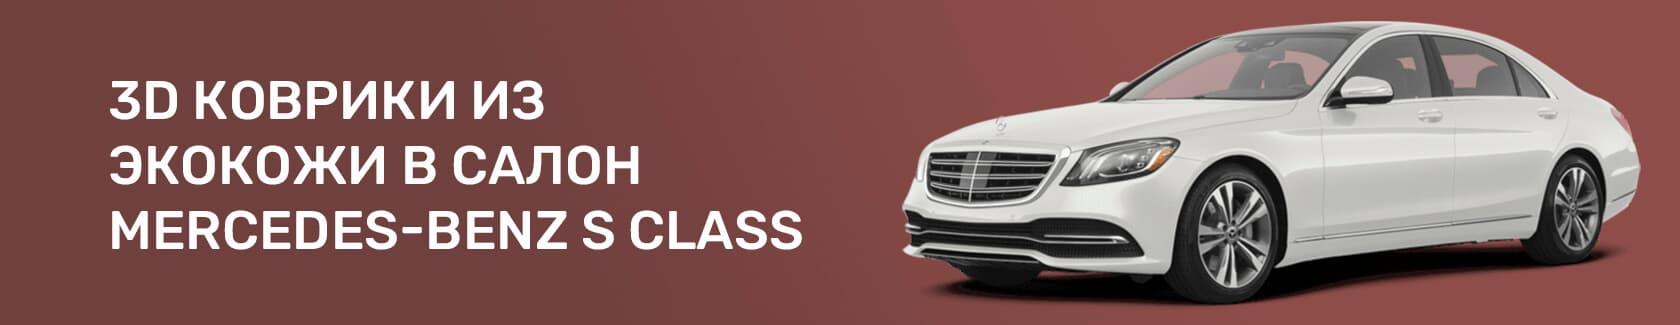 3D-коврики из экокожи на Mercedes-Benz S class в салон и багажник